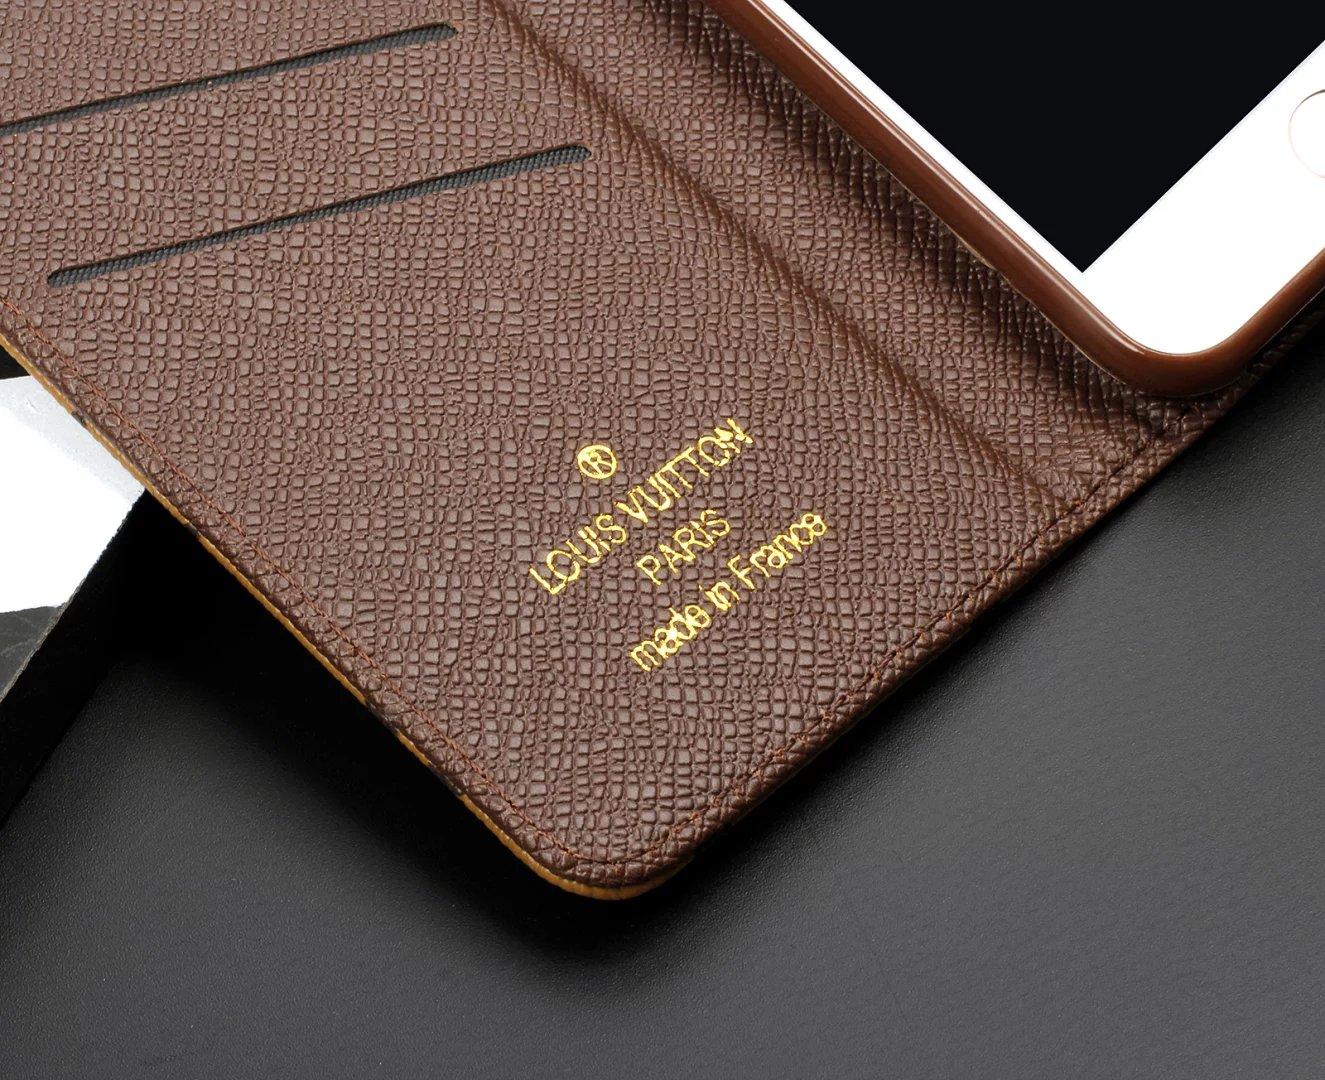 iphone handyhülle selbst gestalten iphone hülle drucken Louis Vuitton iphone 8 hüllen iphone hülle bunt iphone 8 relea8 preis ipad ca8 leder iphone 8 preis wo kann man handyhüllen kaufen flip ca8 E